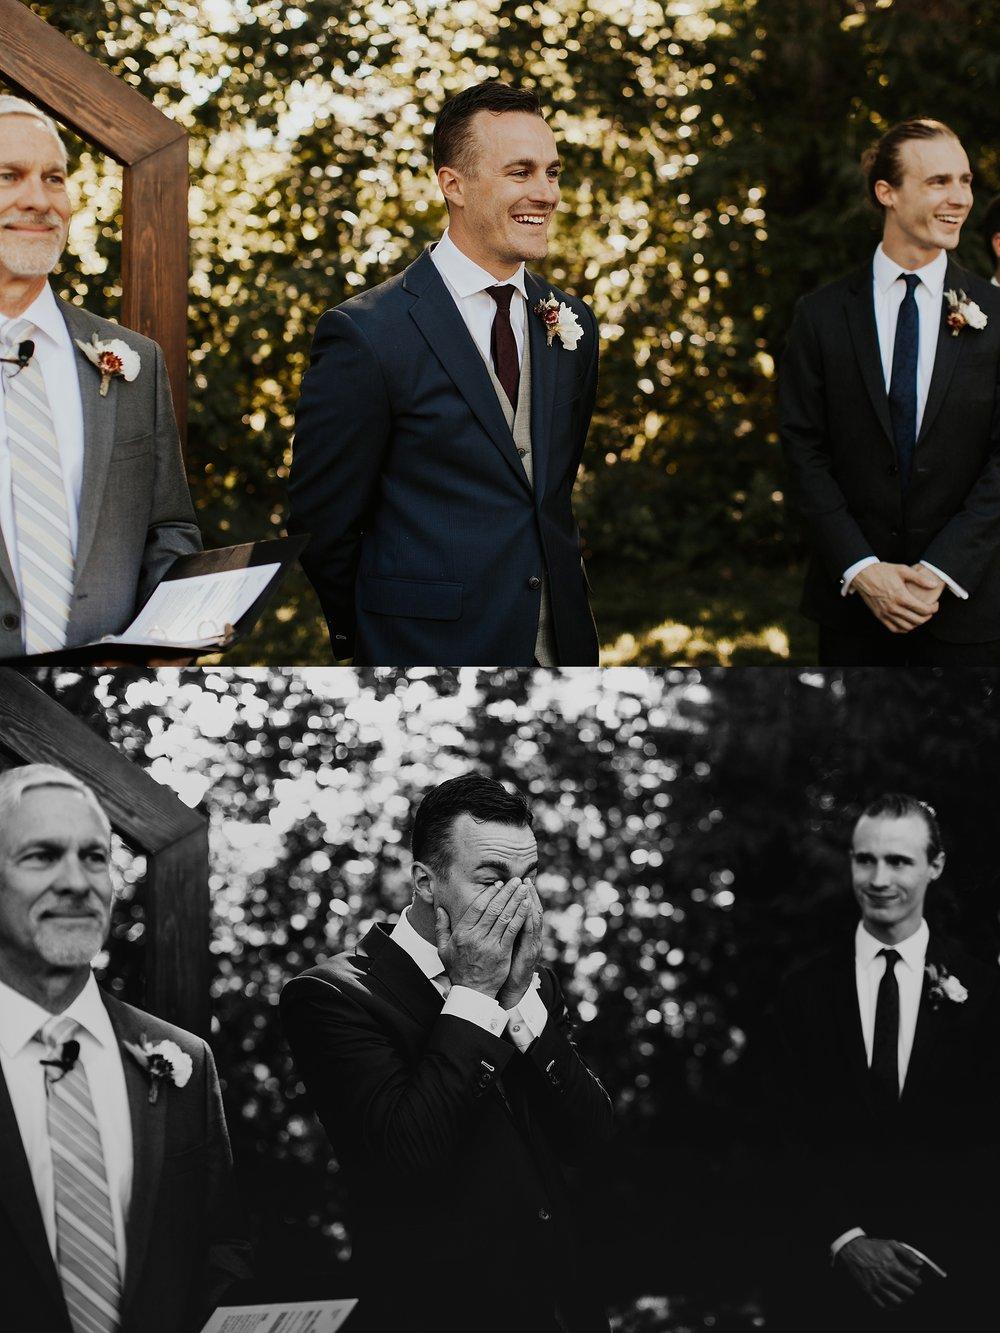 Lyons_Farmette_Wedding_Denver_Colorado_wedding036.JPG